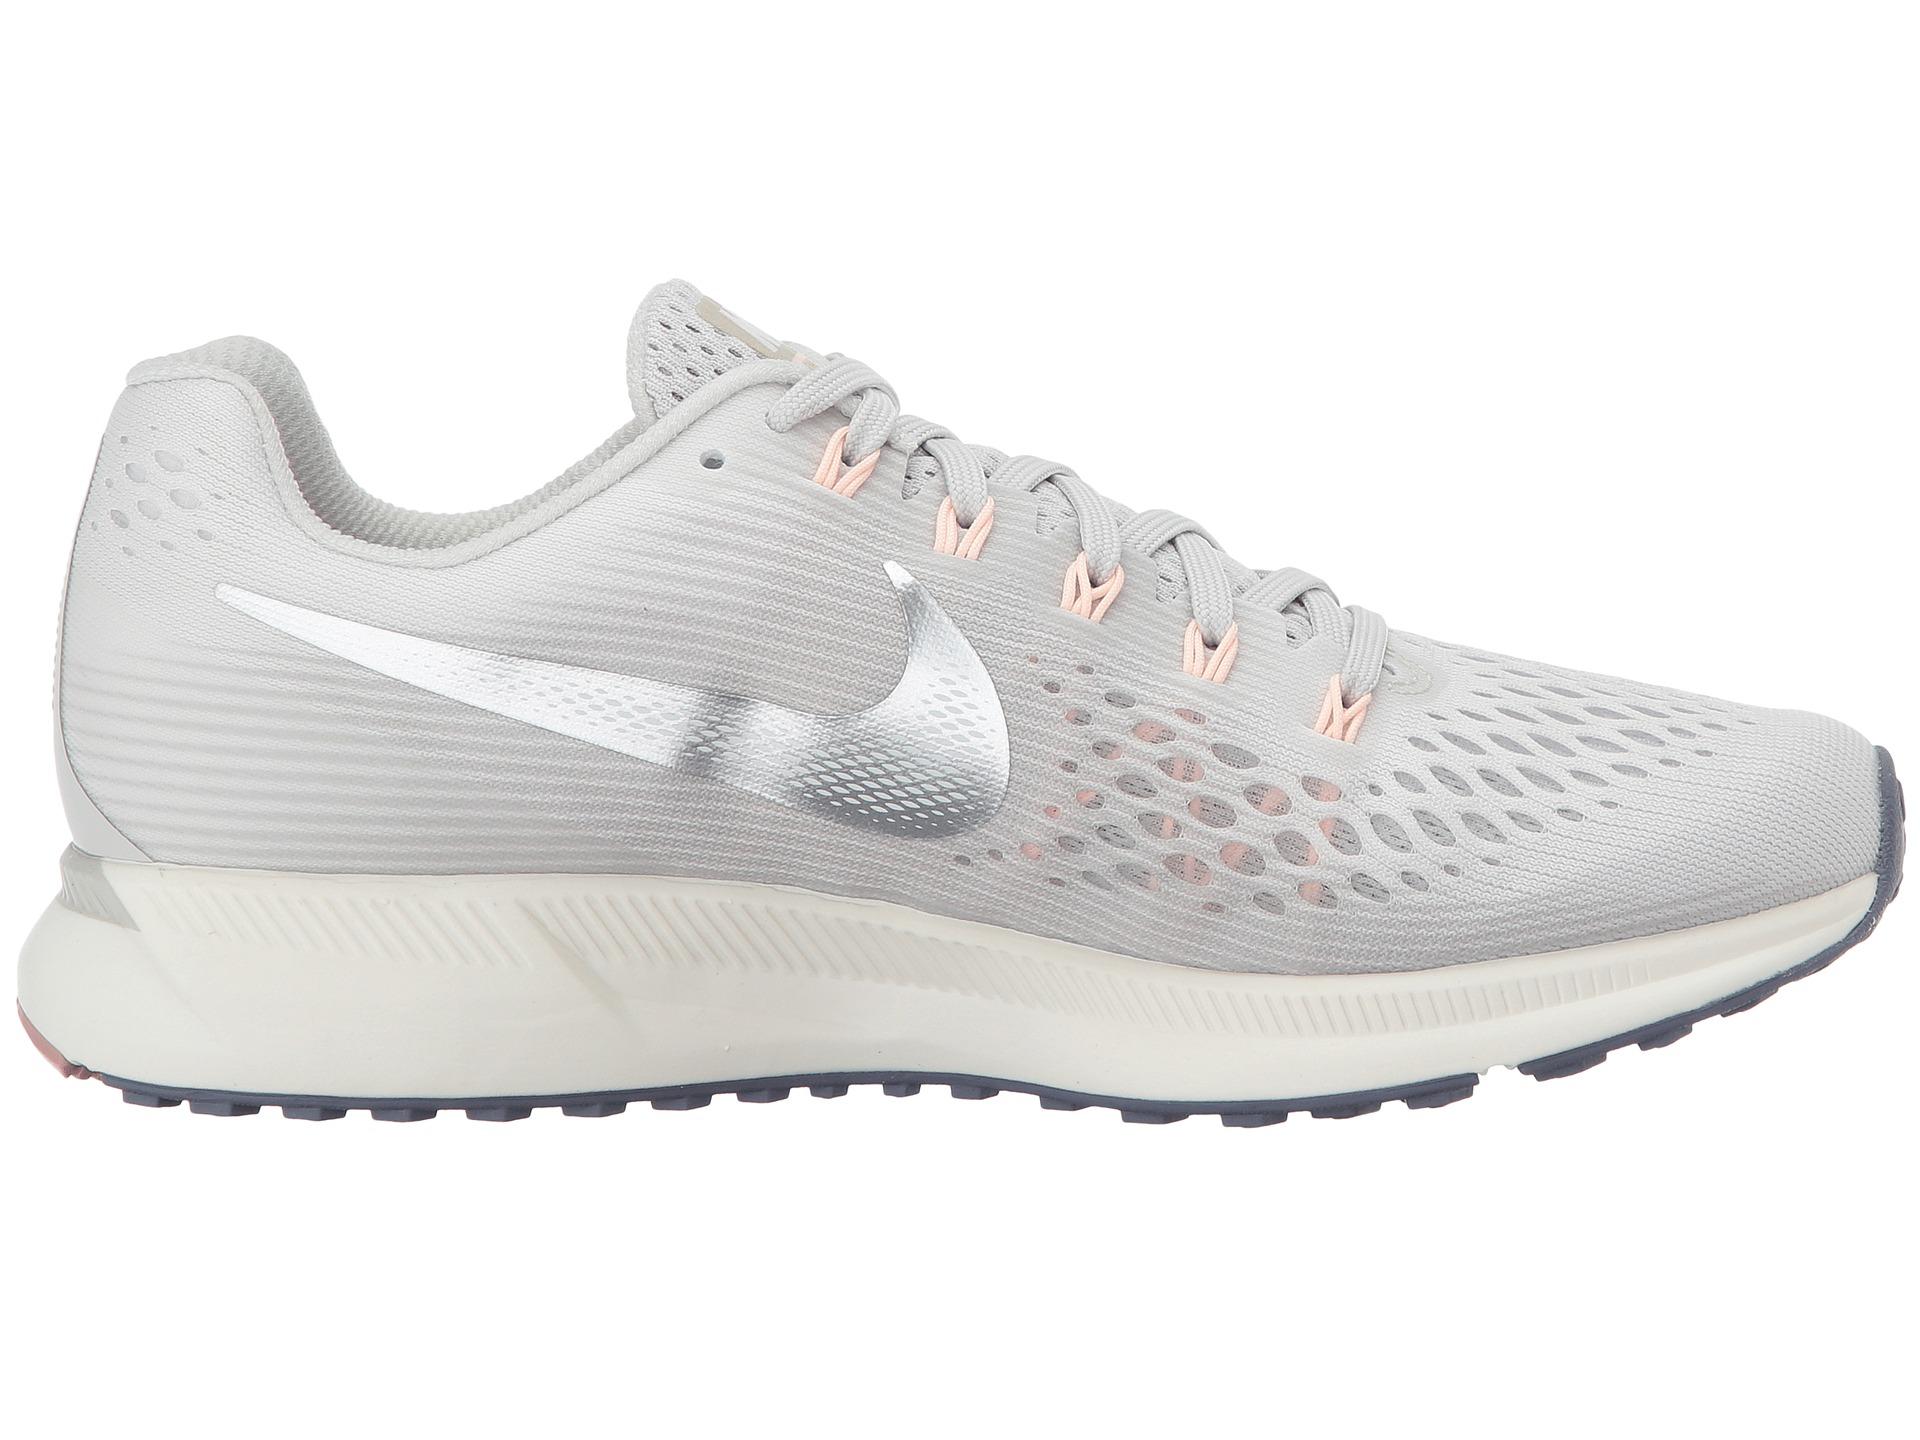 Nike Zoom Javelin Shoes Cheap Nike Air Jordan Parallax Scrolling ... 222213fda